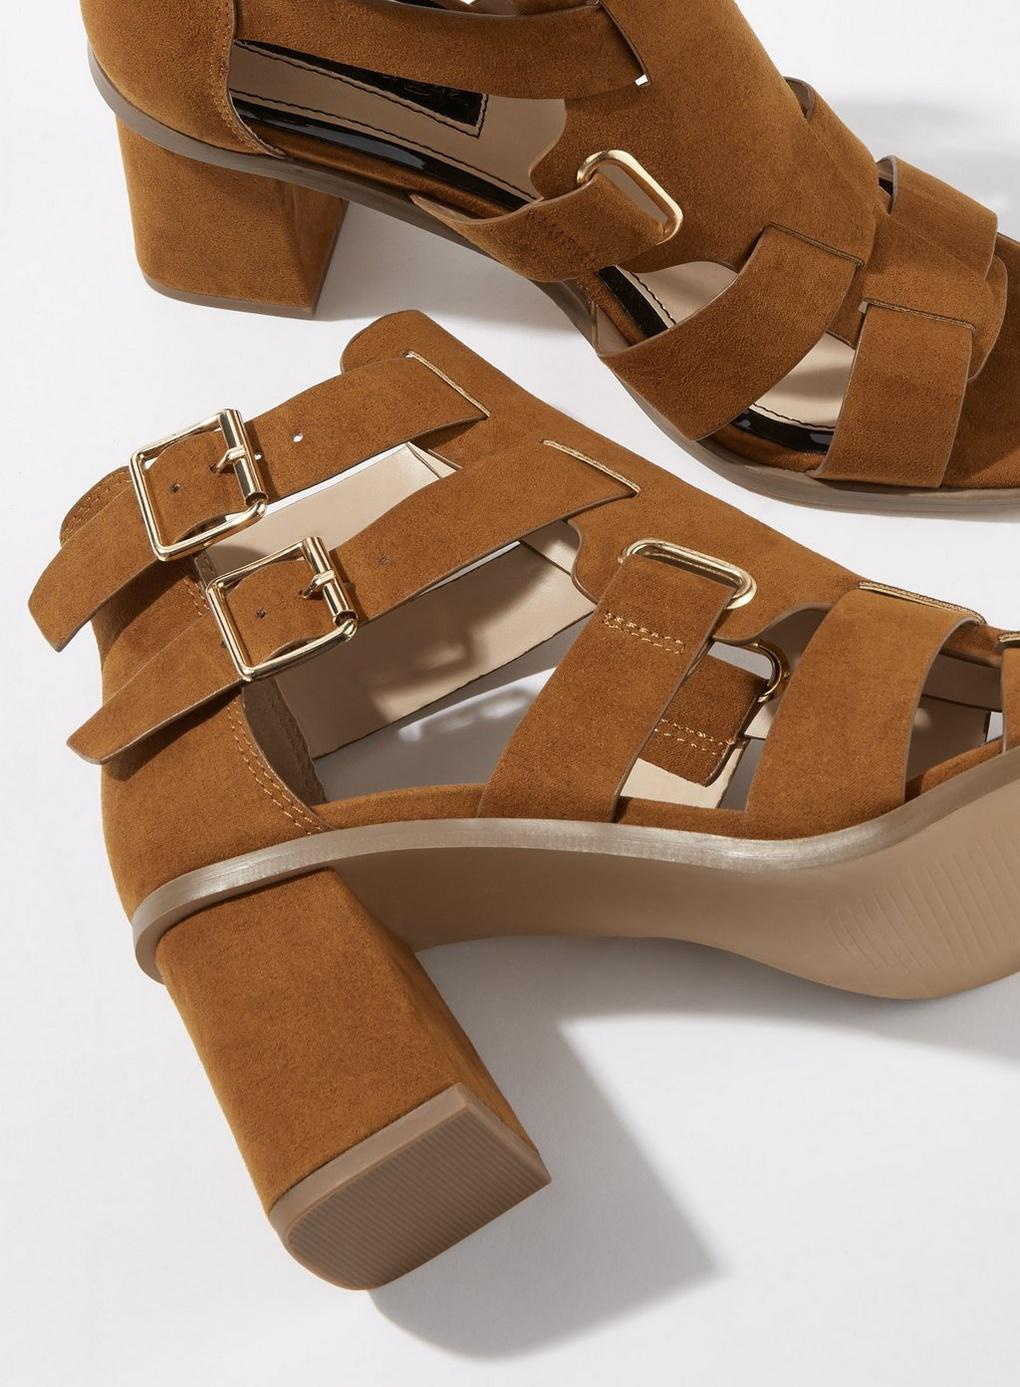 e46ac3f0c0b Miss Selfridge Saffi Tan Buckle Sandals in Brown - Lyst